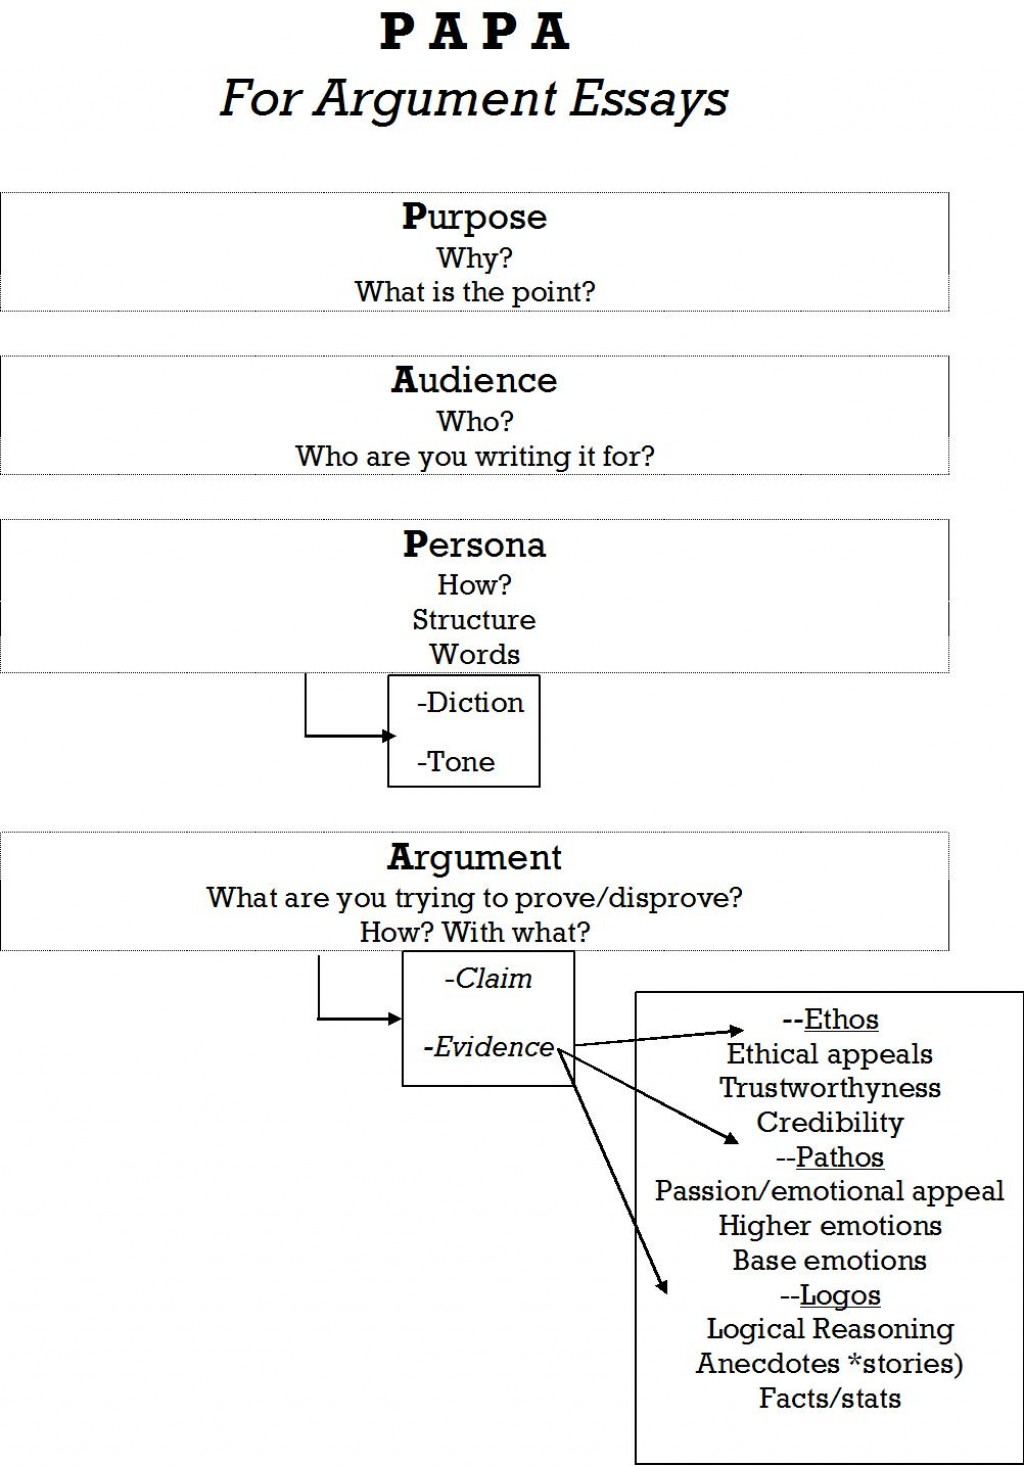 004 Parts Of Persuasive Essay Papa Jpg Imposing 6 A Large